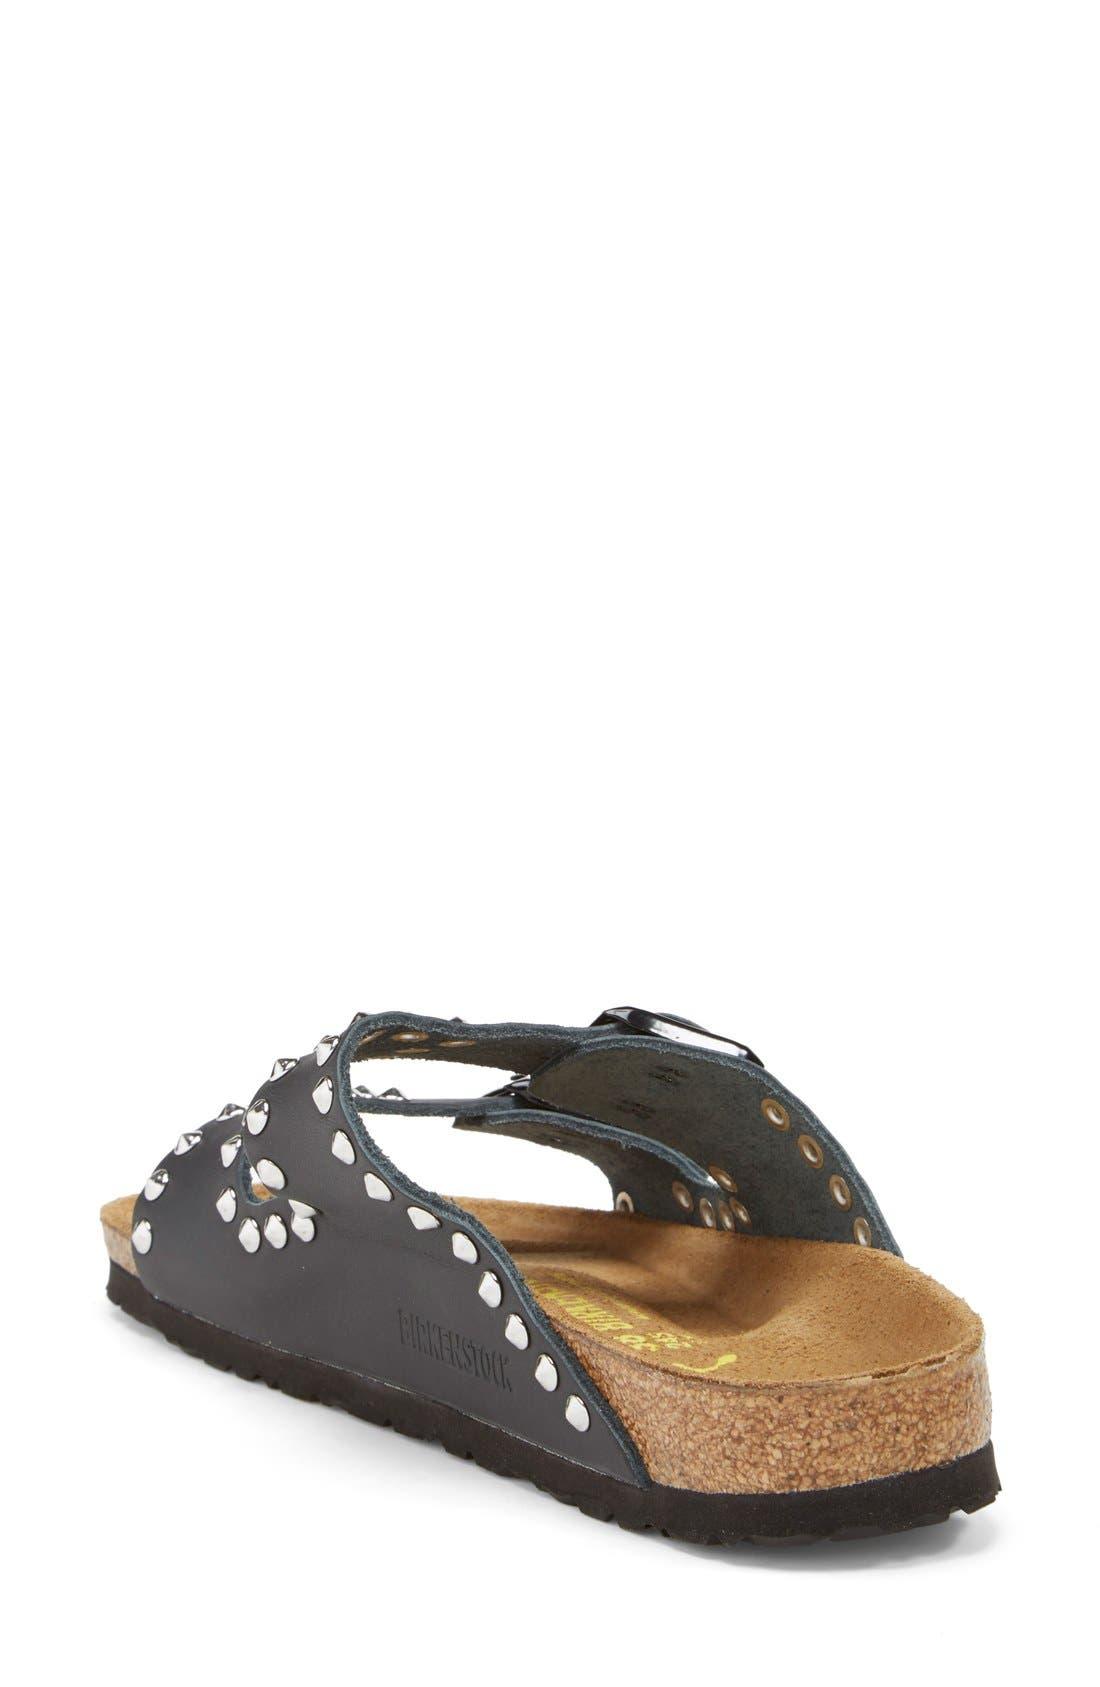 BIRKENSTOCK, 'Arizona' Studded Leather Sandal, Alternate thumbnail 3, color, 001